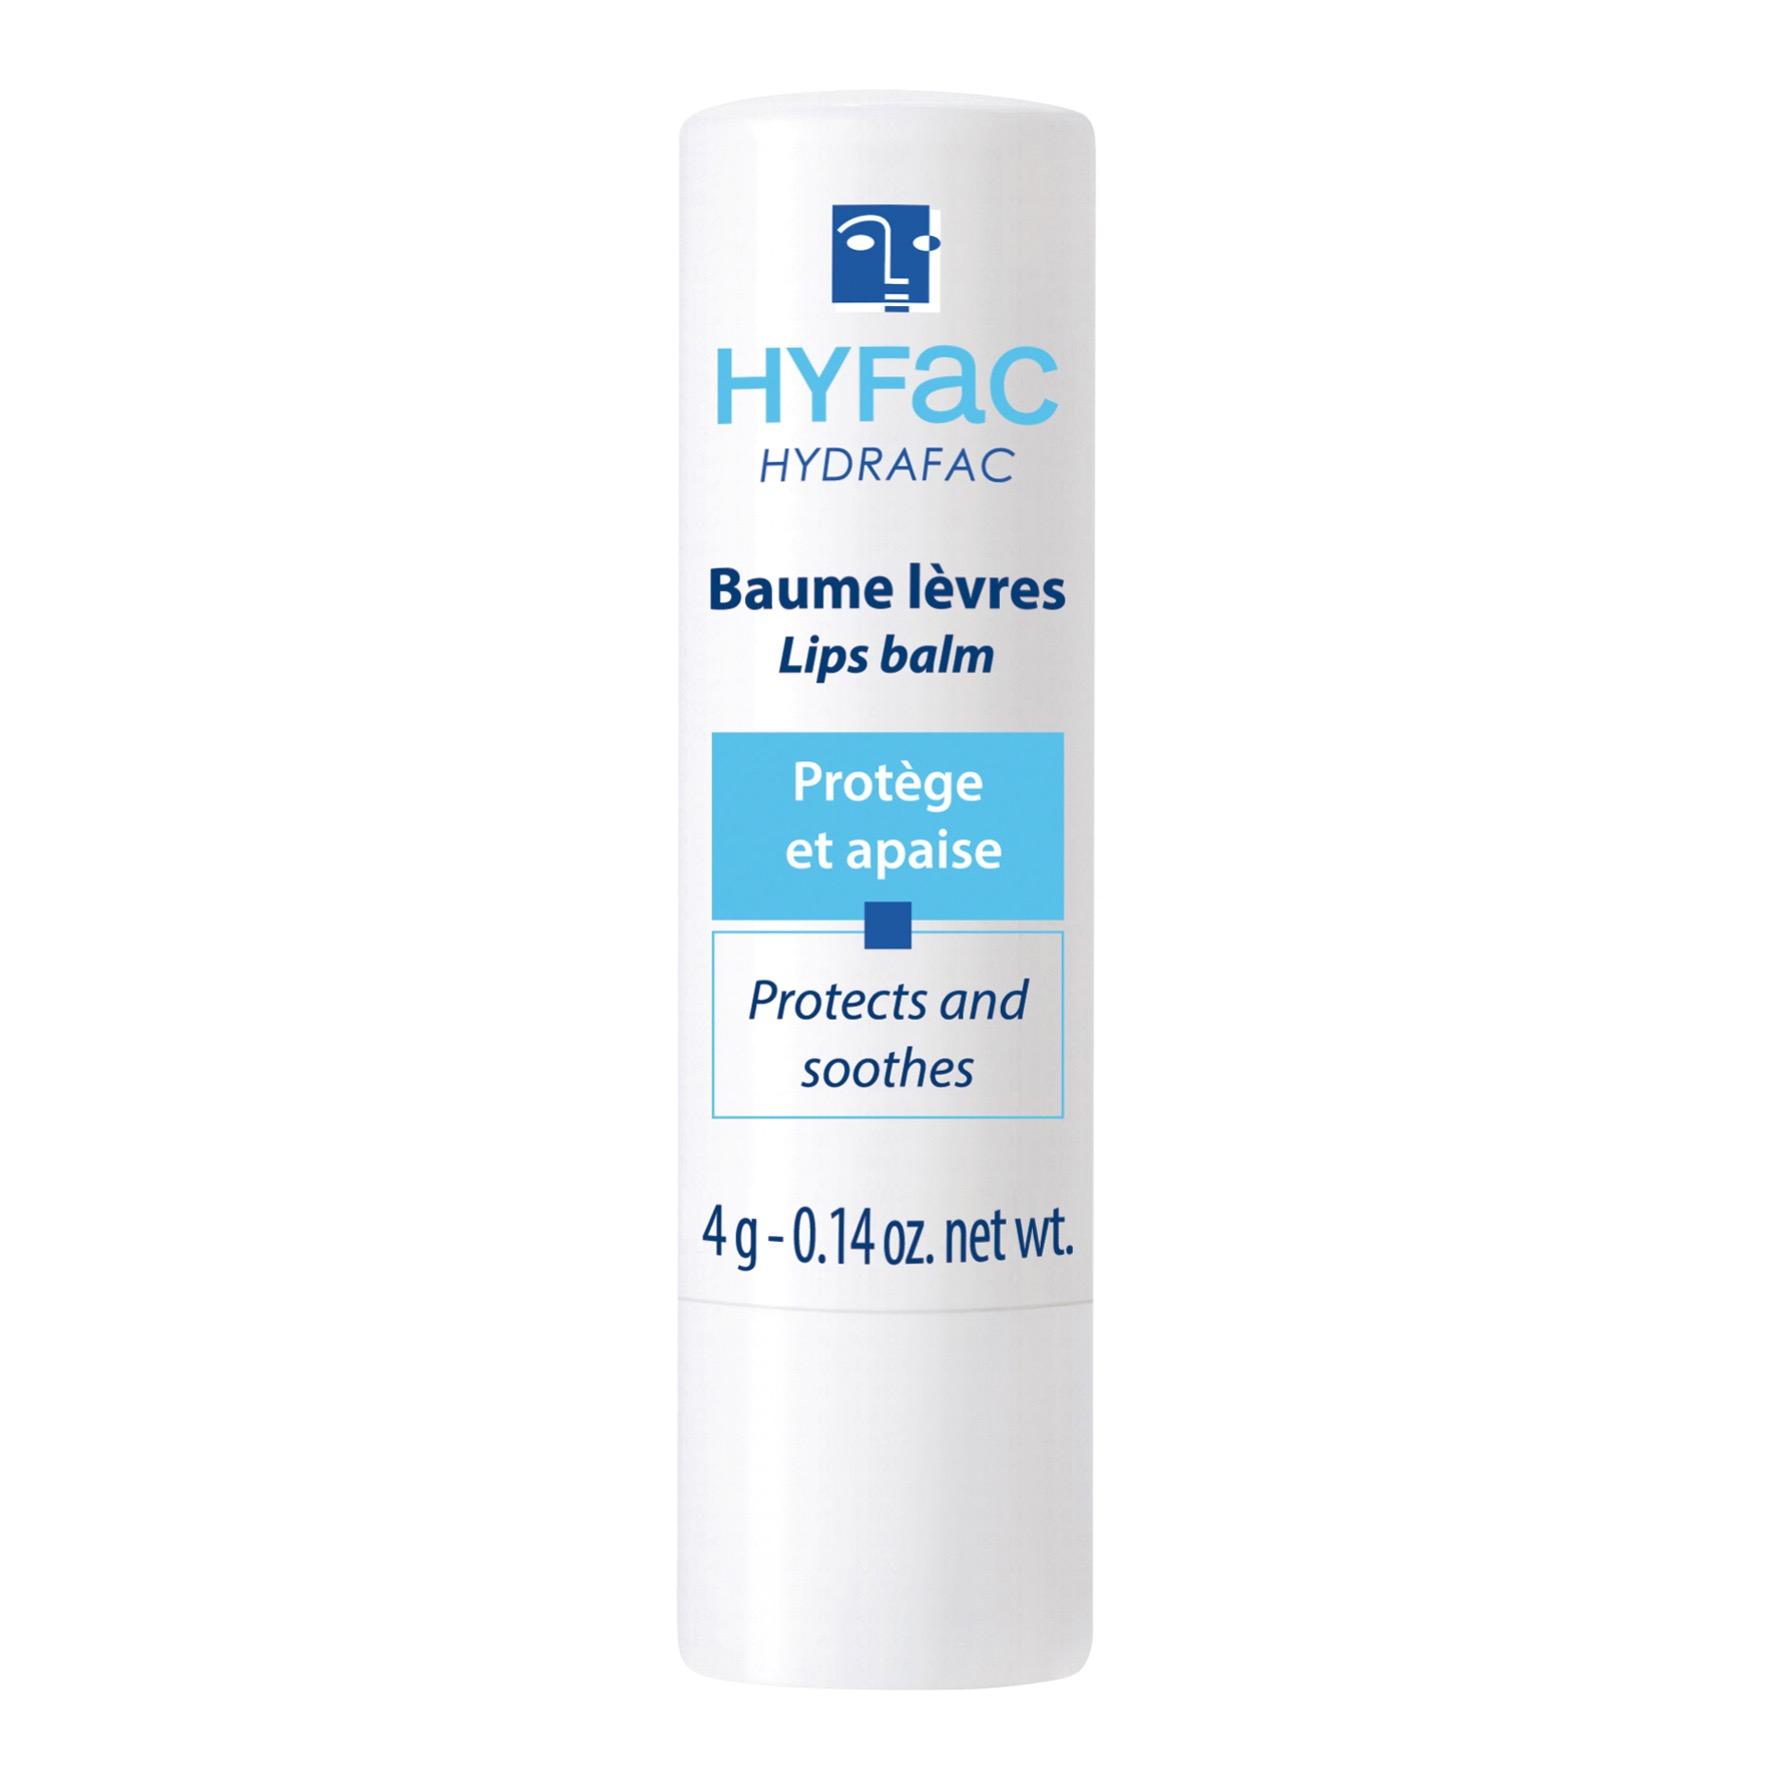 HYDRAFAC Baume lèvres nourissant hydratant